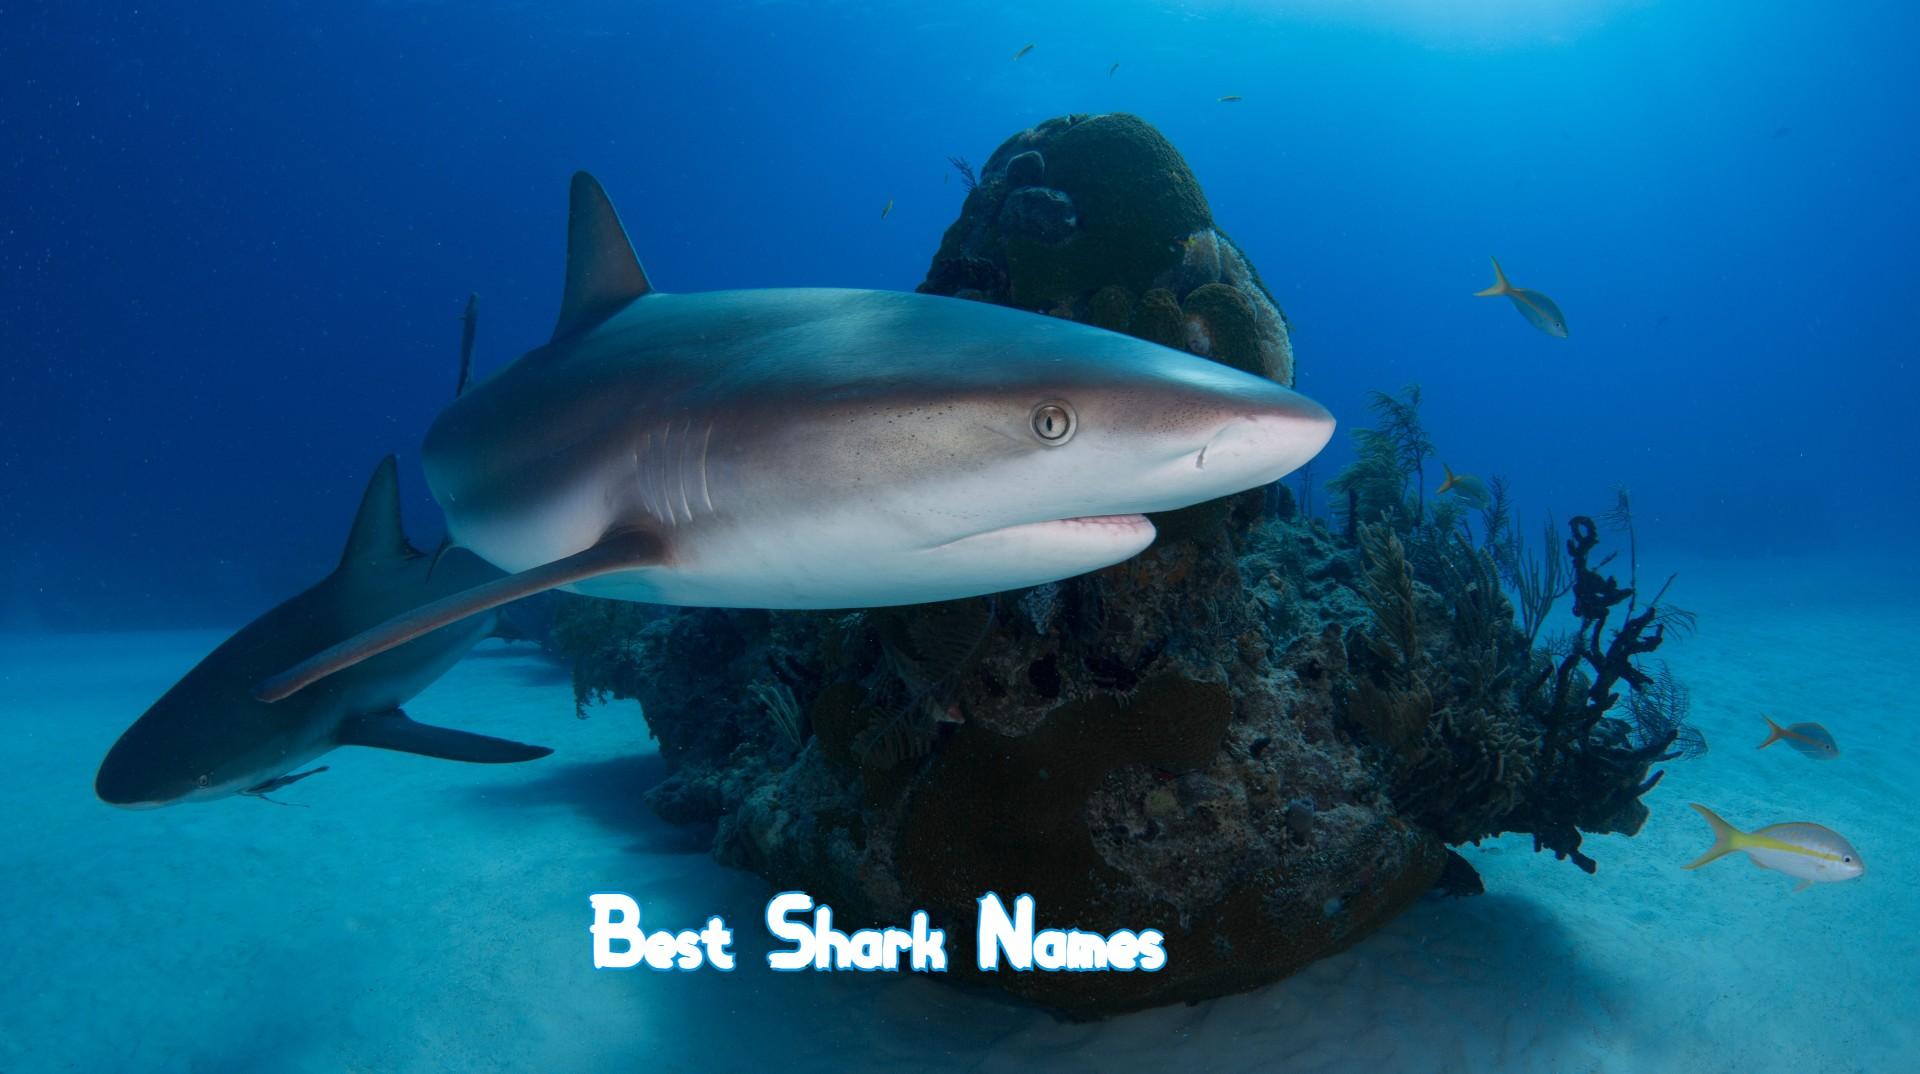 best-shark-names